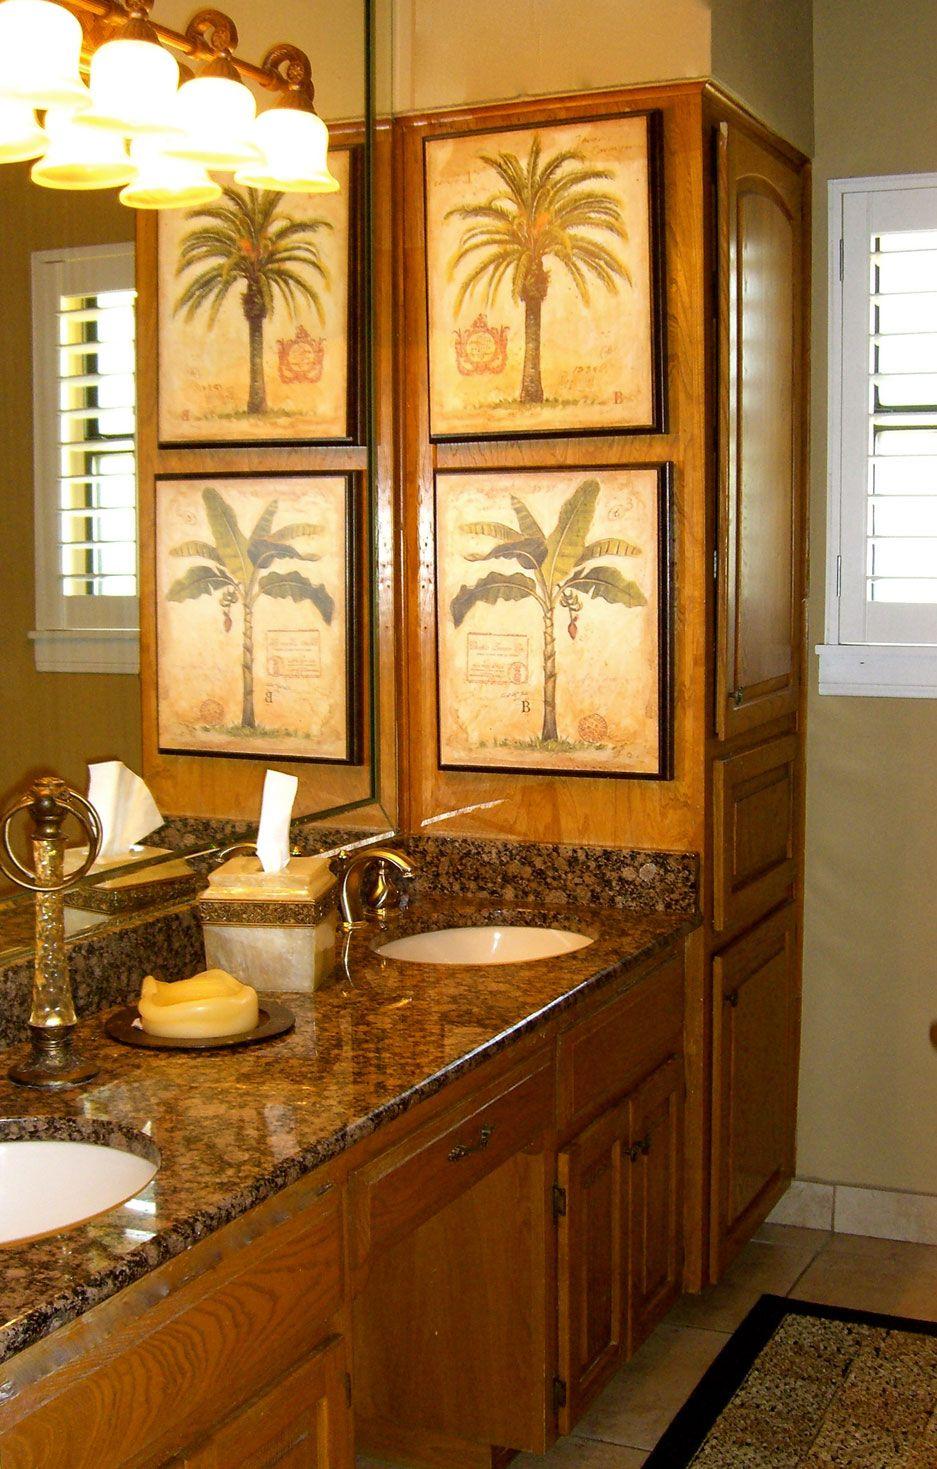 Pin by Diane Moran on Bathrooms  Palm tree bathroom, Bathroom